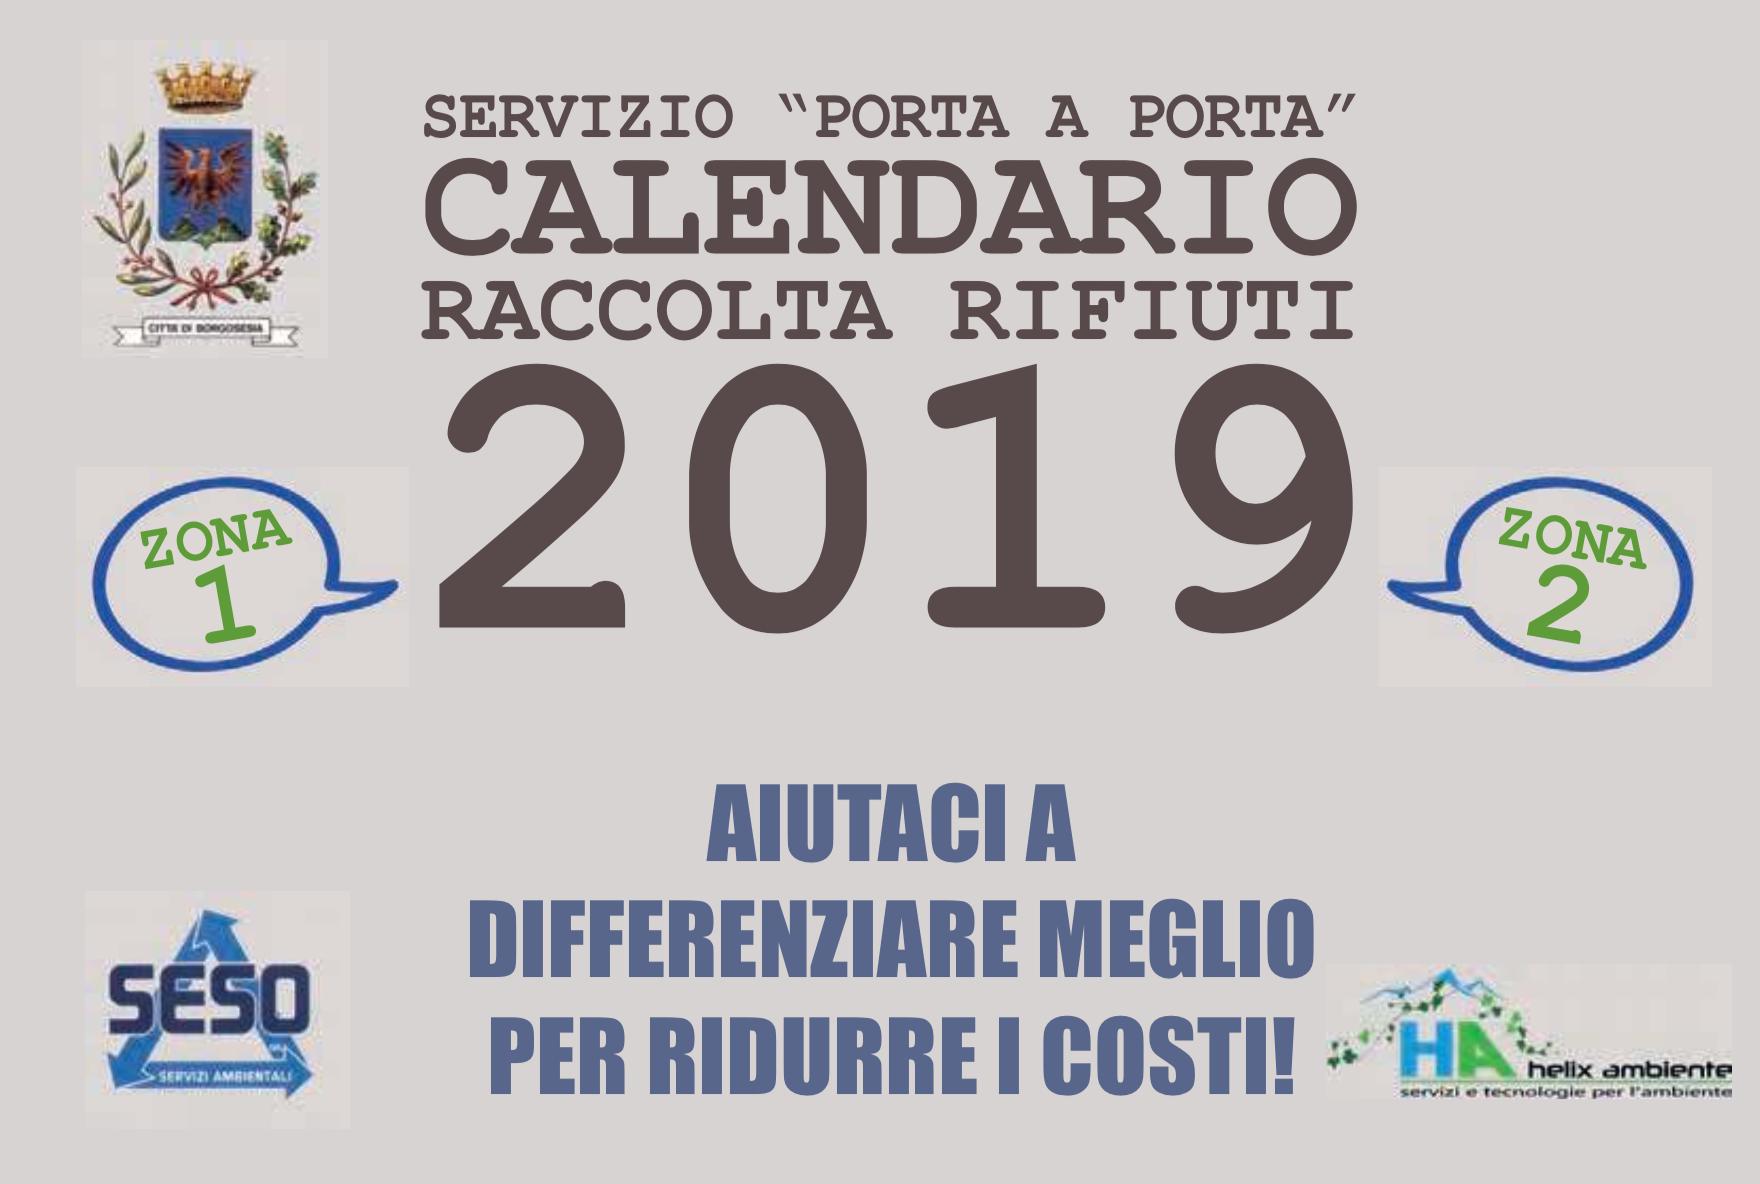 CALENDARIO raccolta rifiuti borgosesia 2019